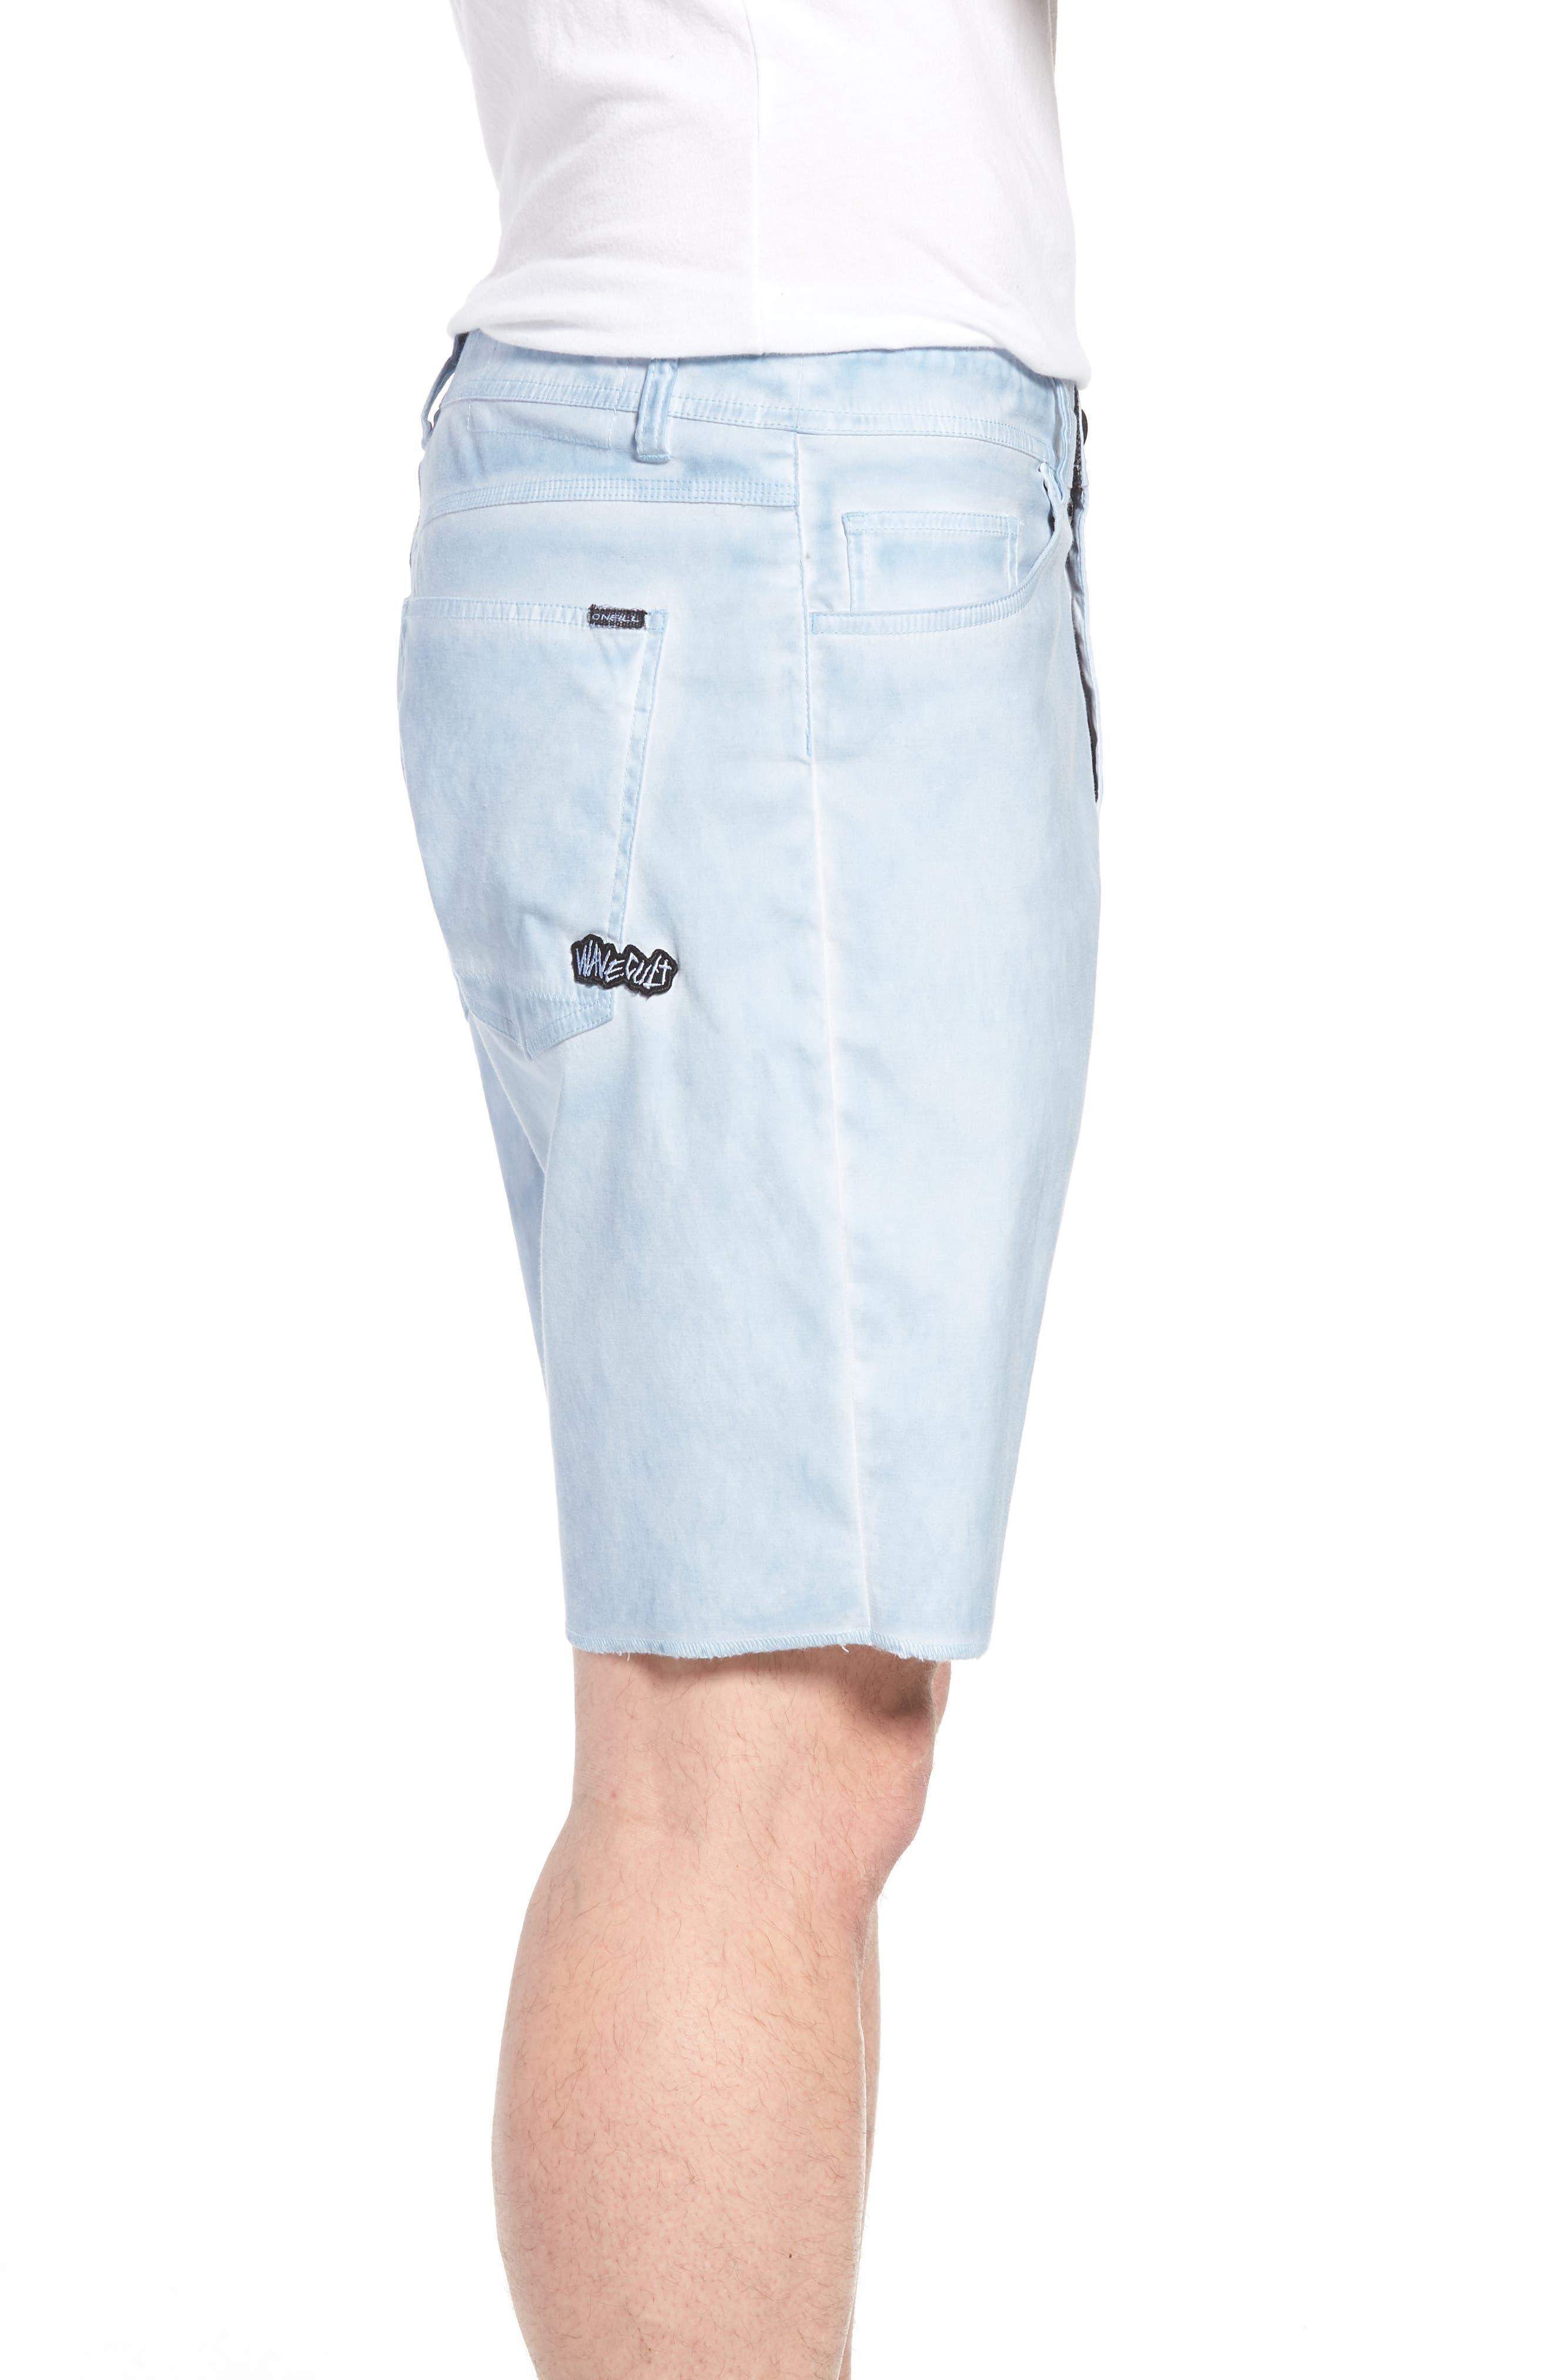 Kick Back Hybrid Shorts,                             Alternate thumbnail 3, color,                             Light Indigo